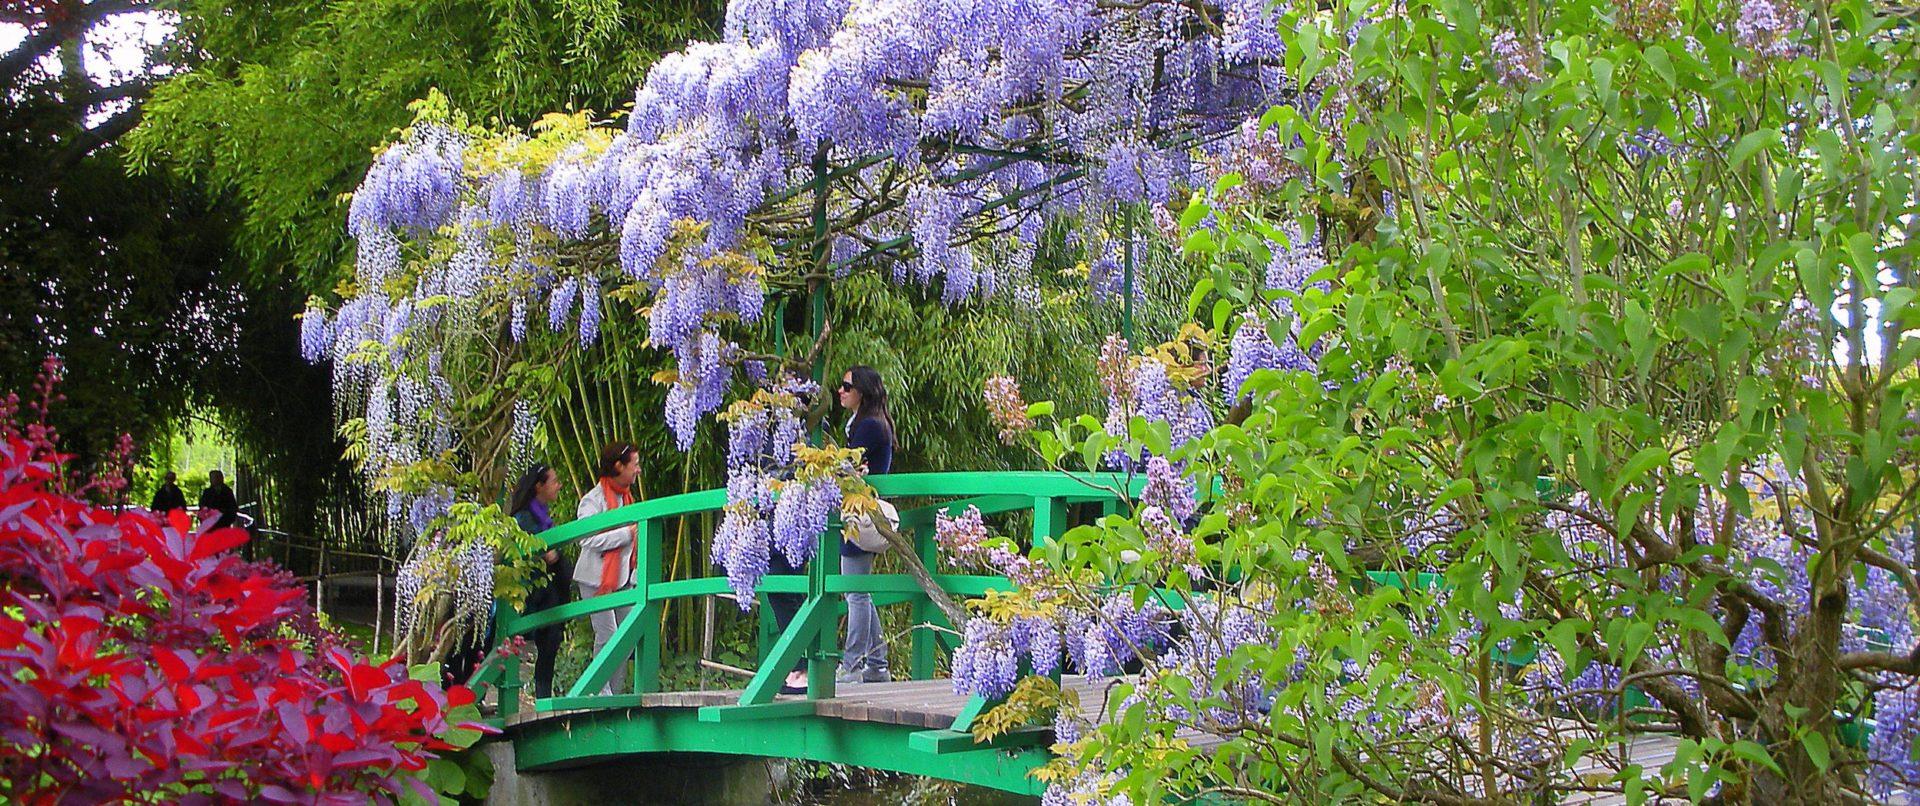 giverny-Monet-garden-family-tour